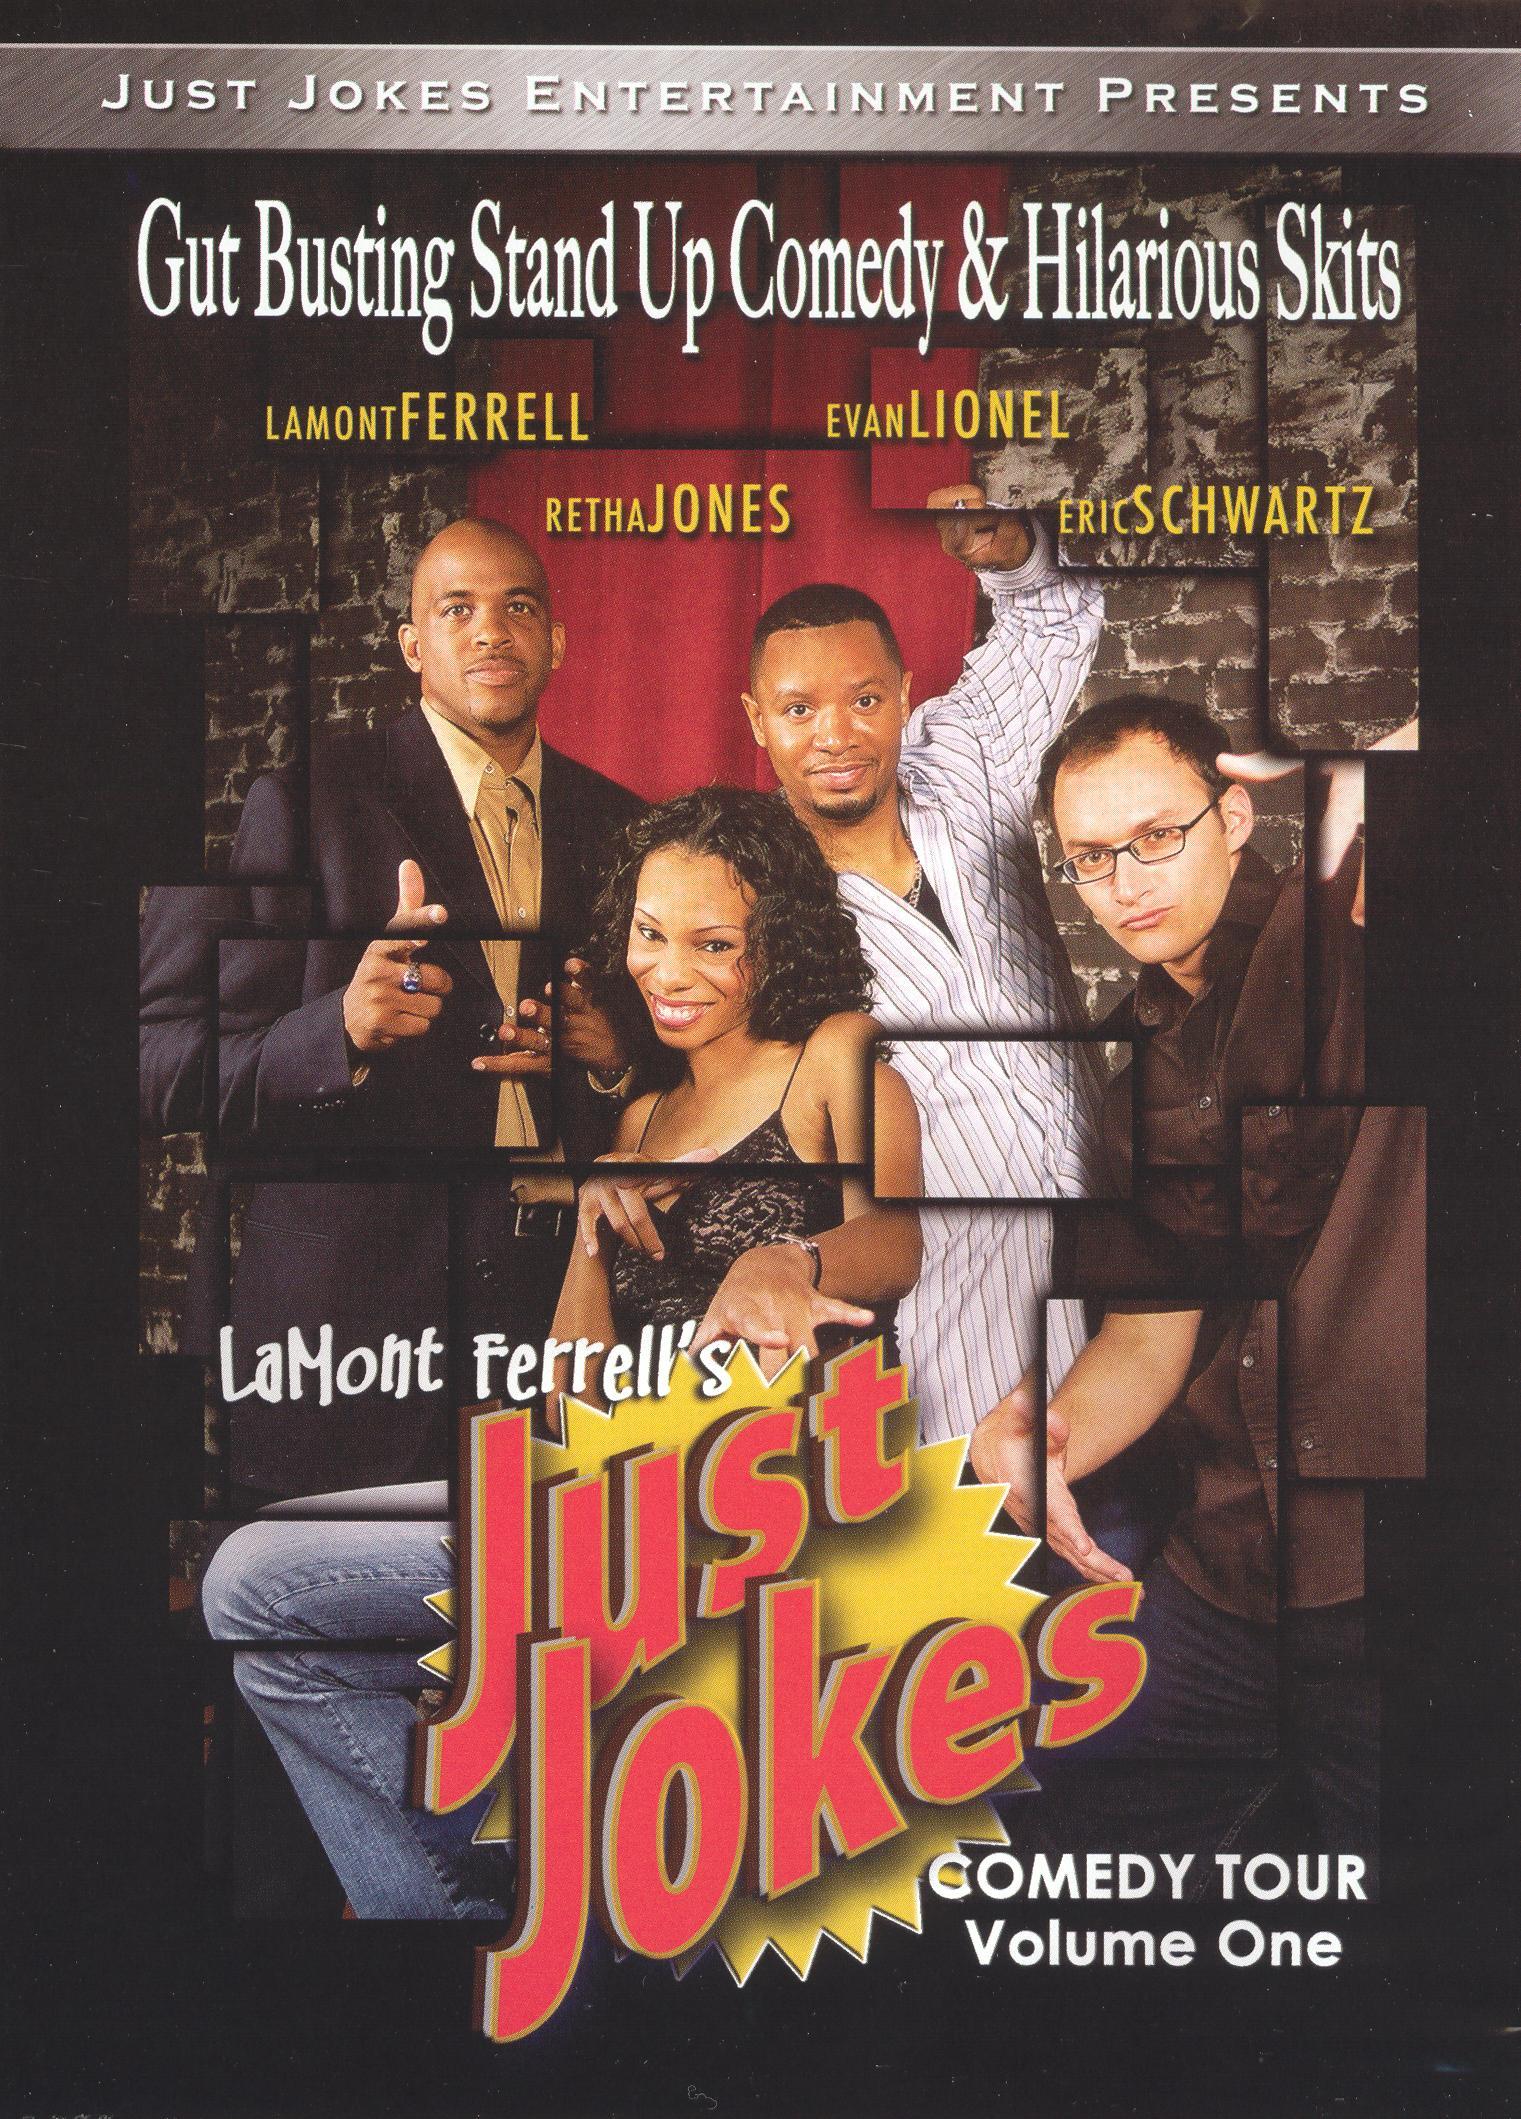 Lamont Ferrell's Just Jokes Comedy Tour, Vol. 1